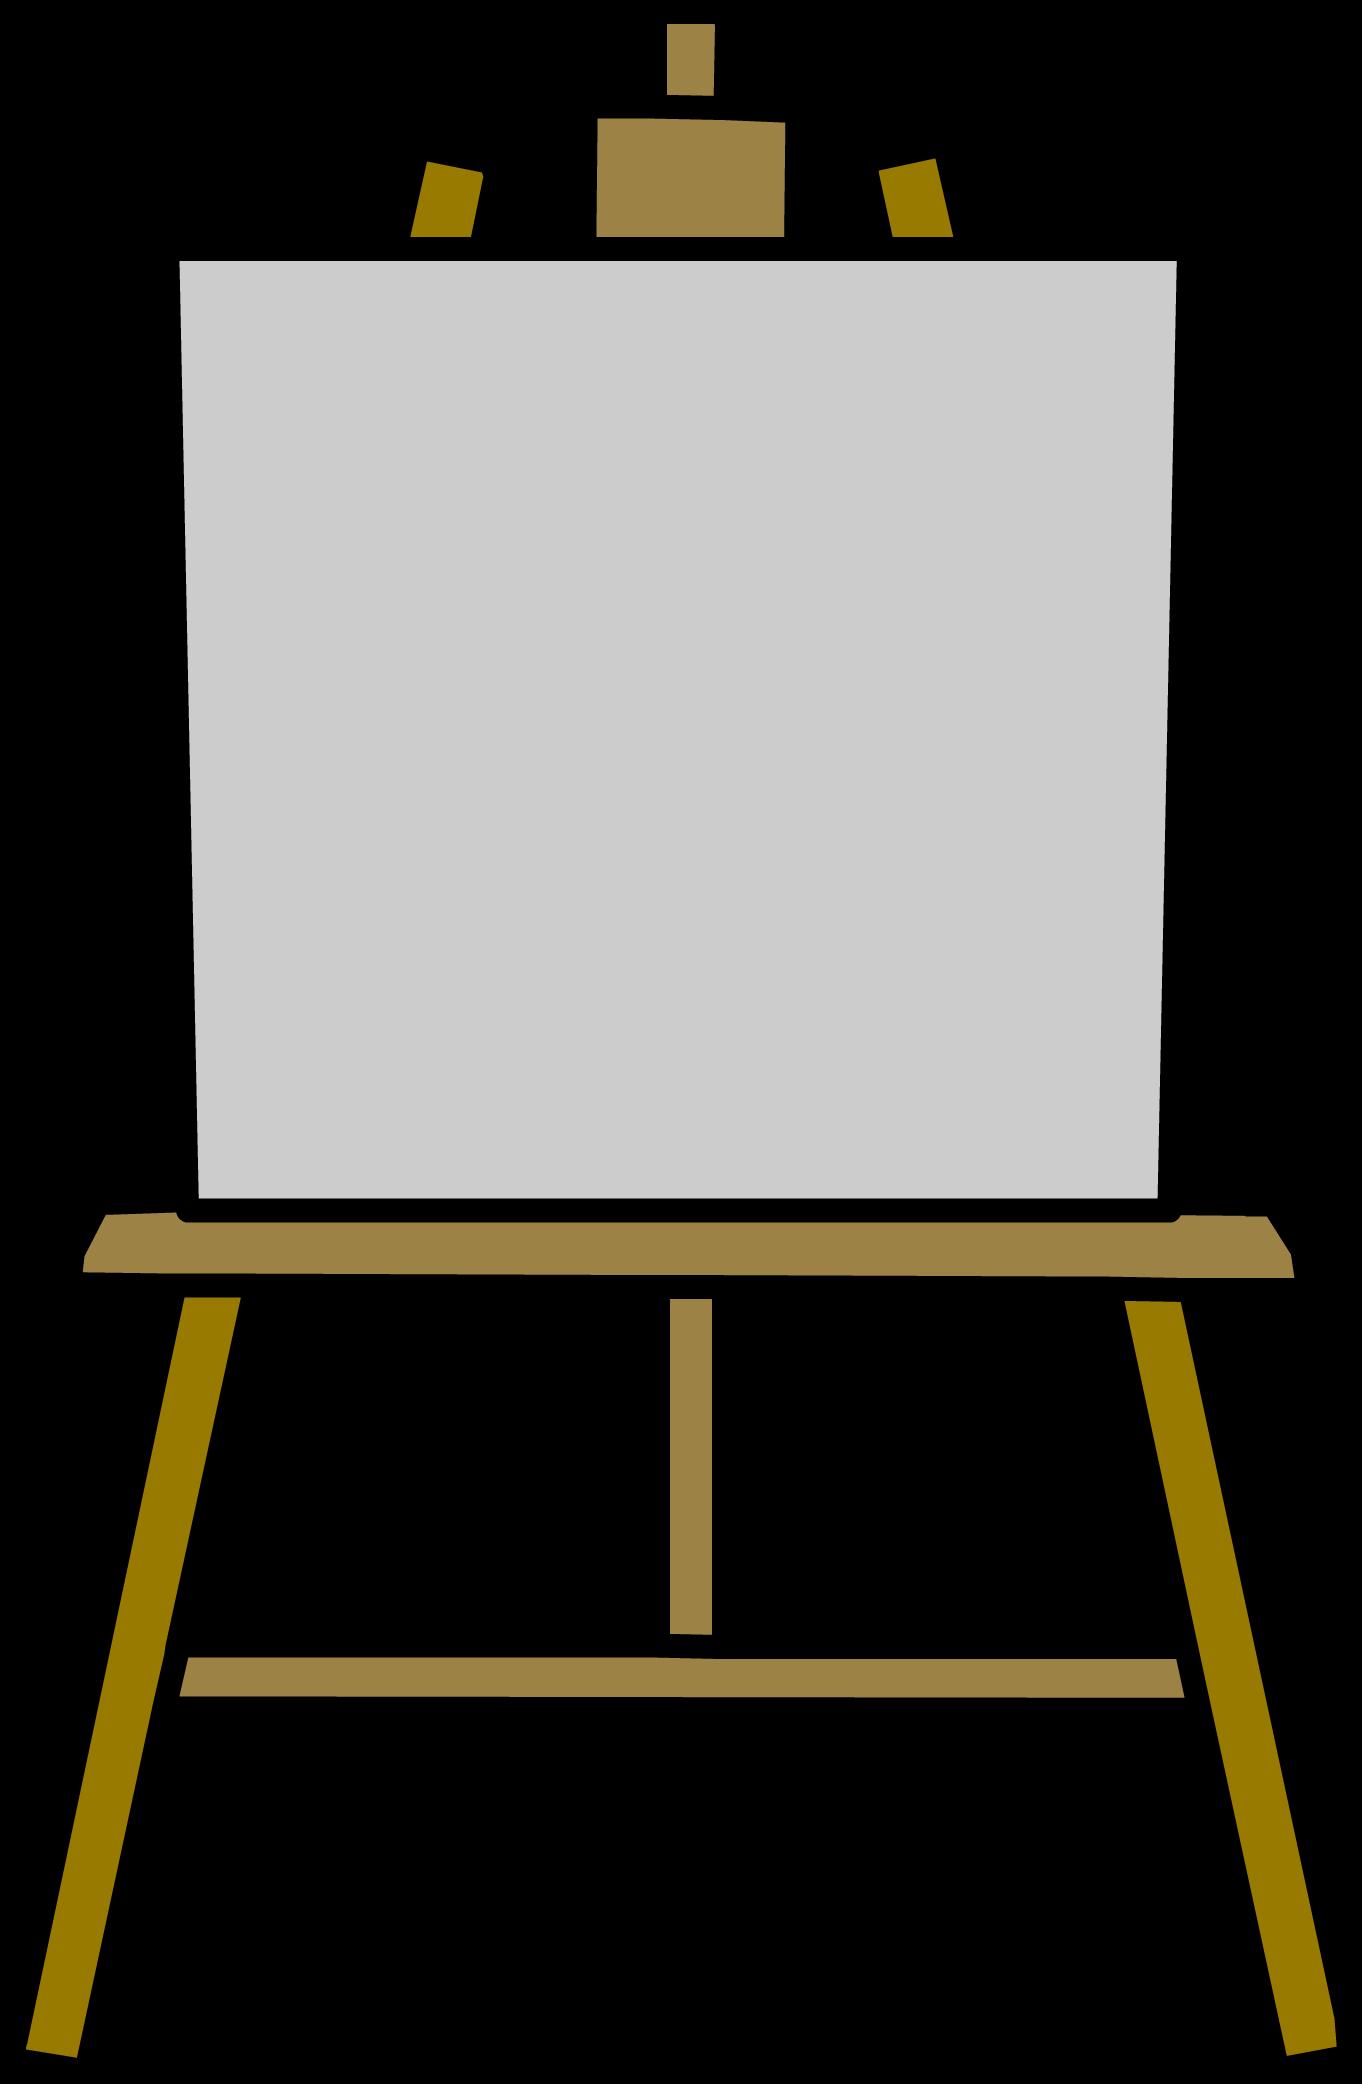 Easel | Club Penguin Wiki | Fandom powered by Wikia